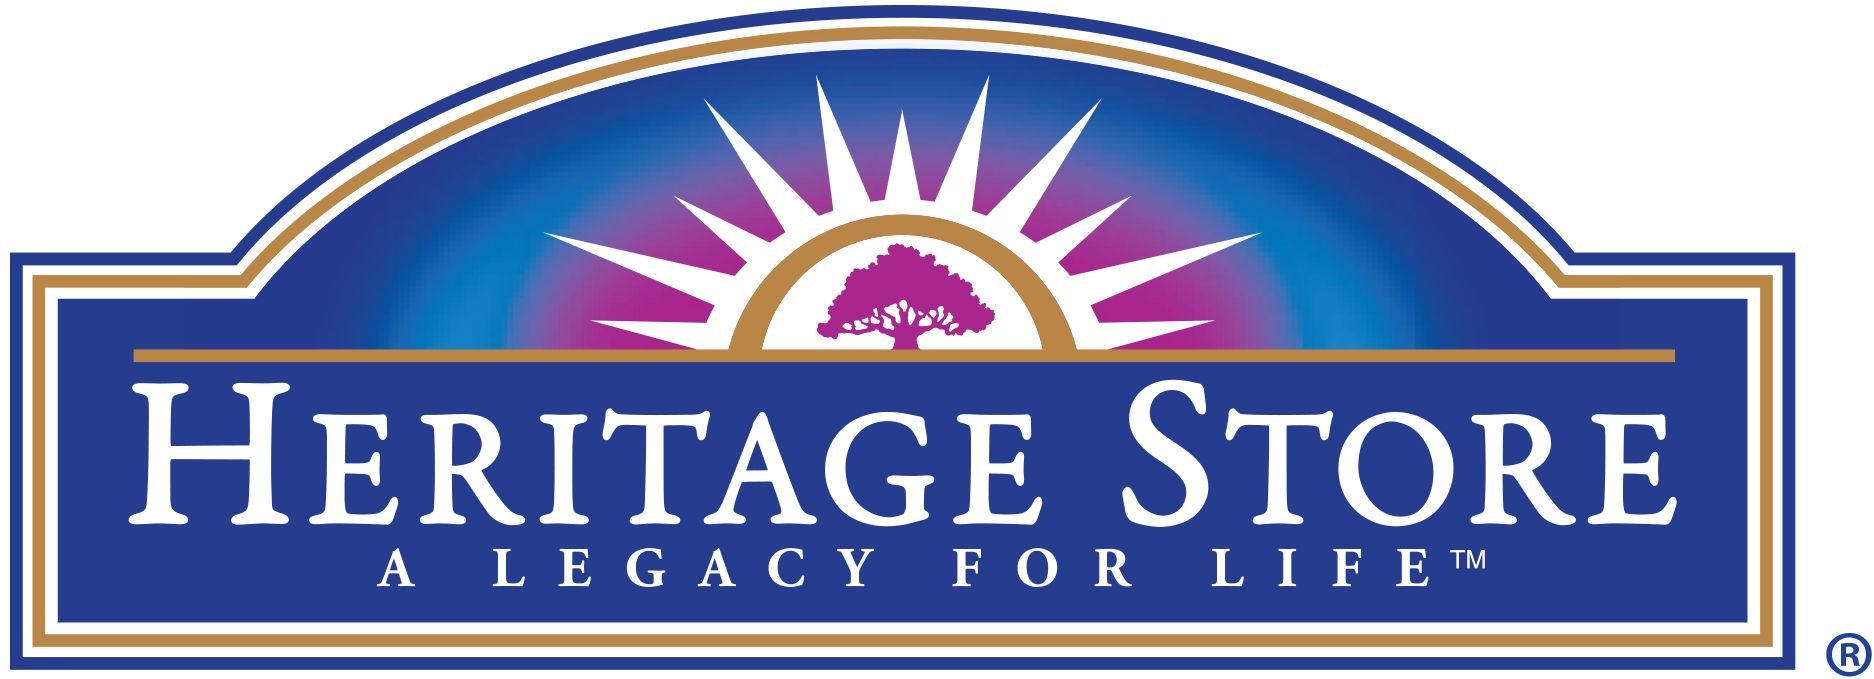 Heritage Store - هيريتيج ستور